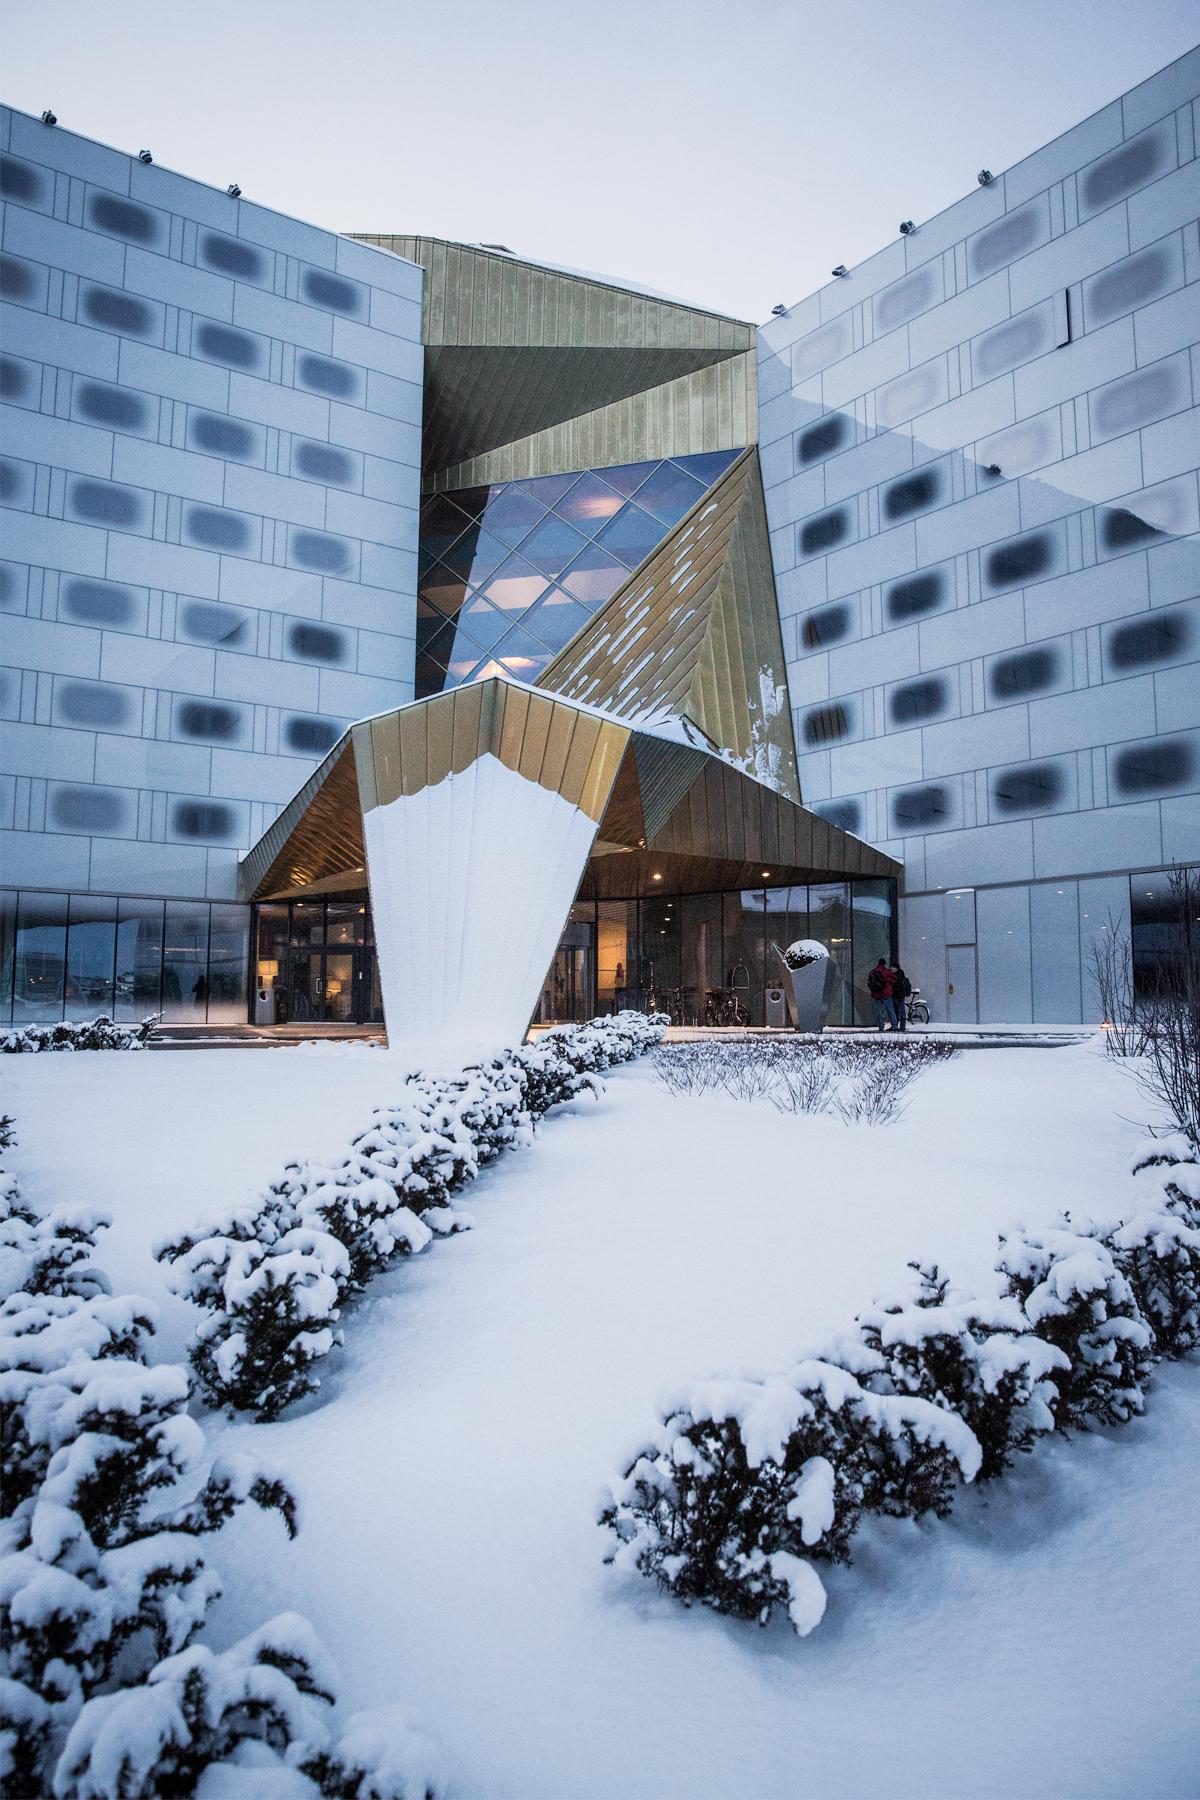 Clarion Hotel & Congress Trondheim, Norway. Architect: Plan Arkitekter AS